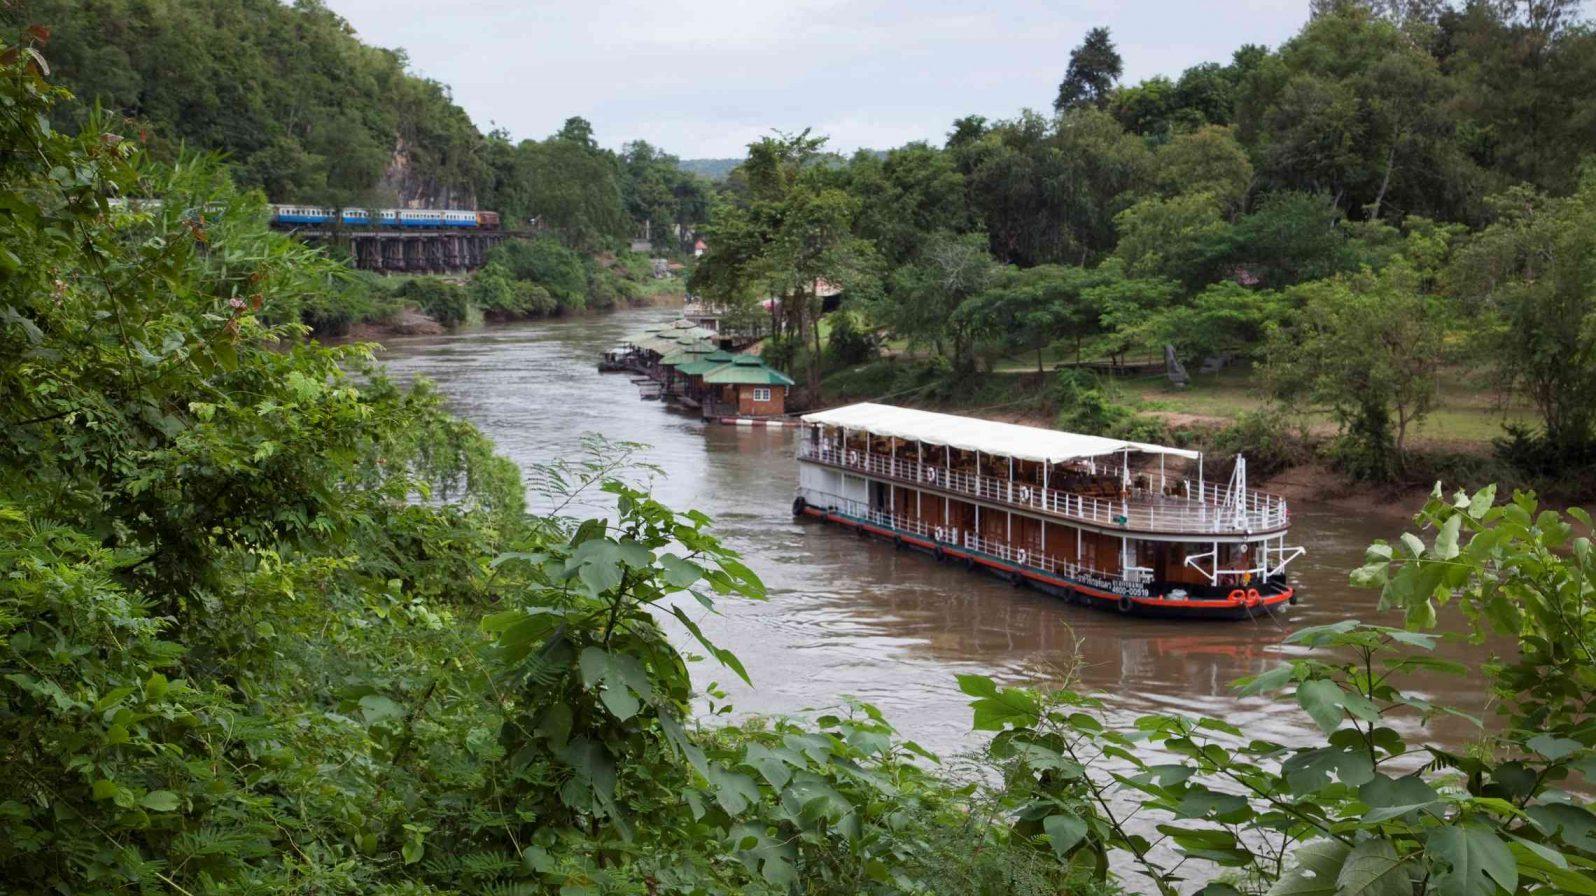 River-Kwai-yleiskuva2-©Holger-Leue-1596x896.jpg